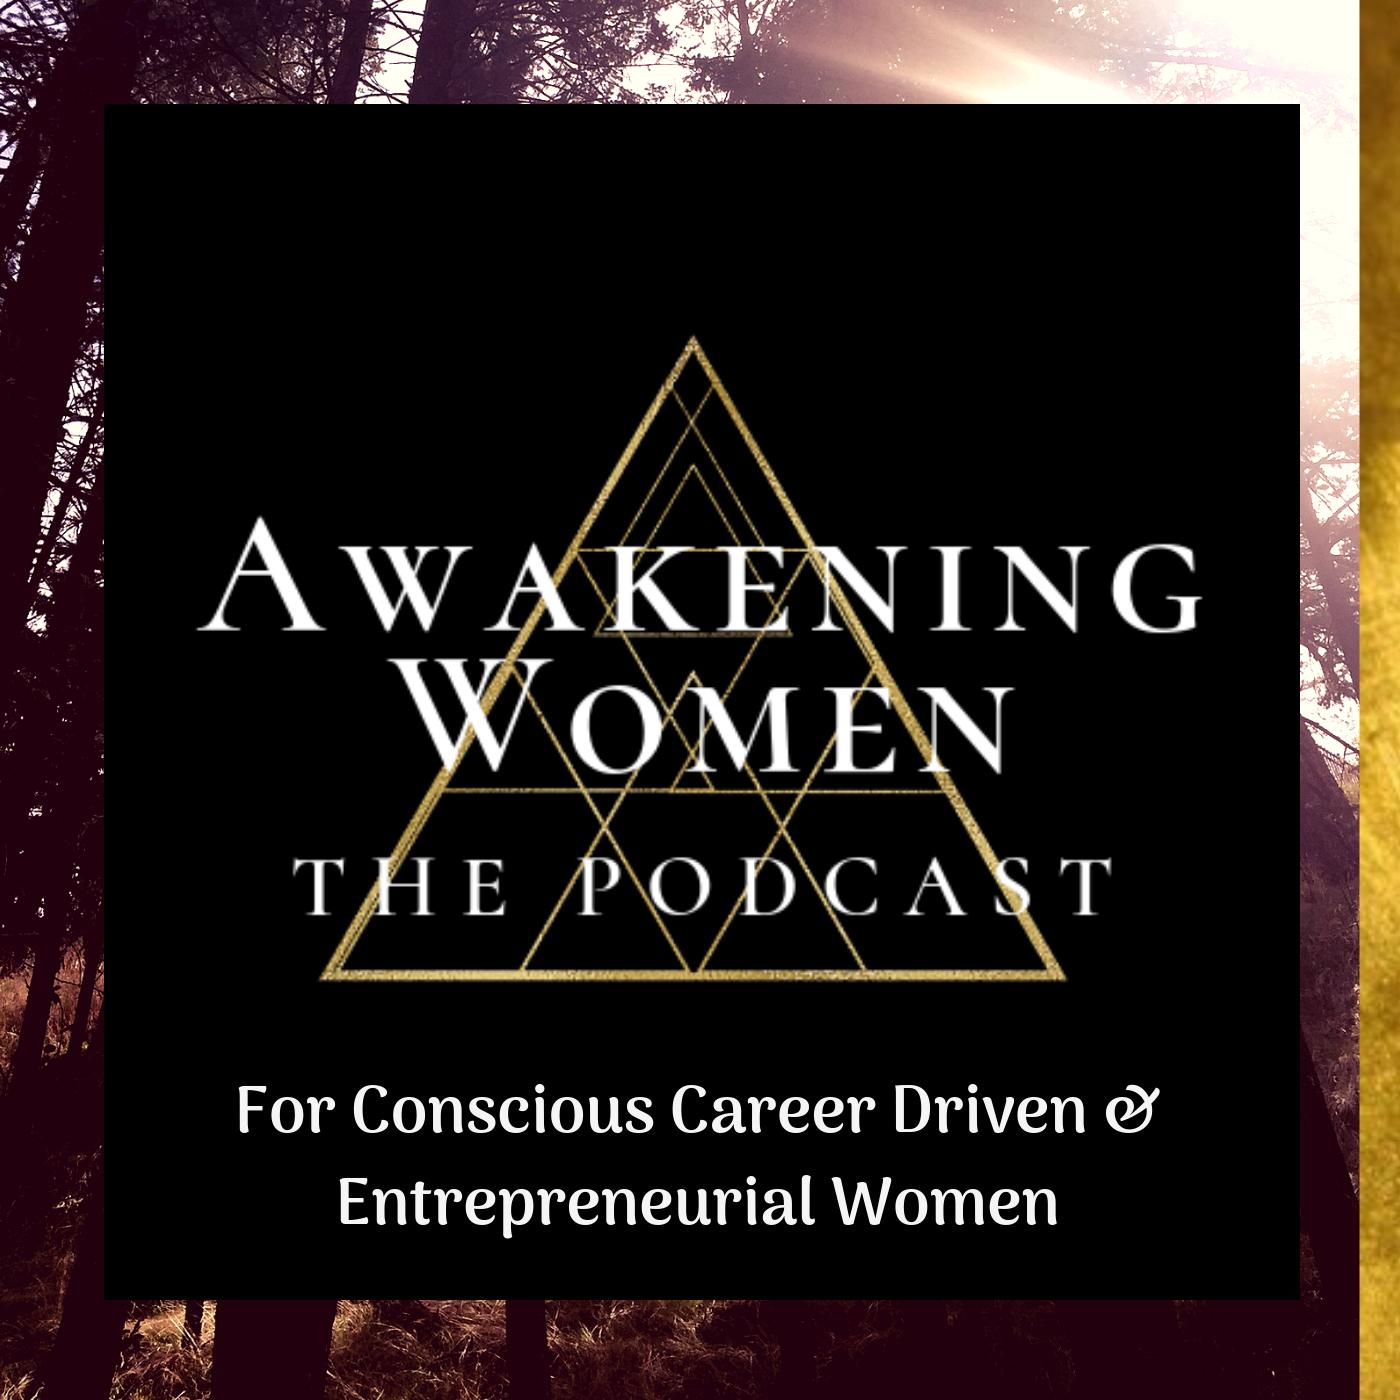 Awakening Women Podcast show art